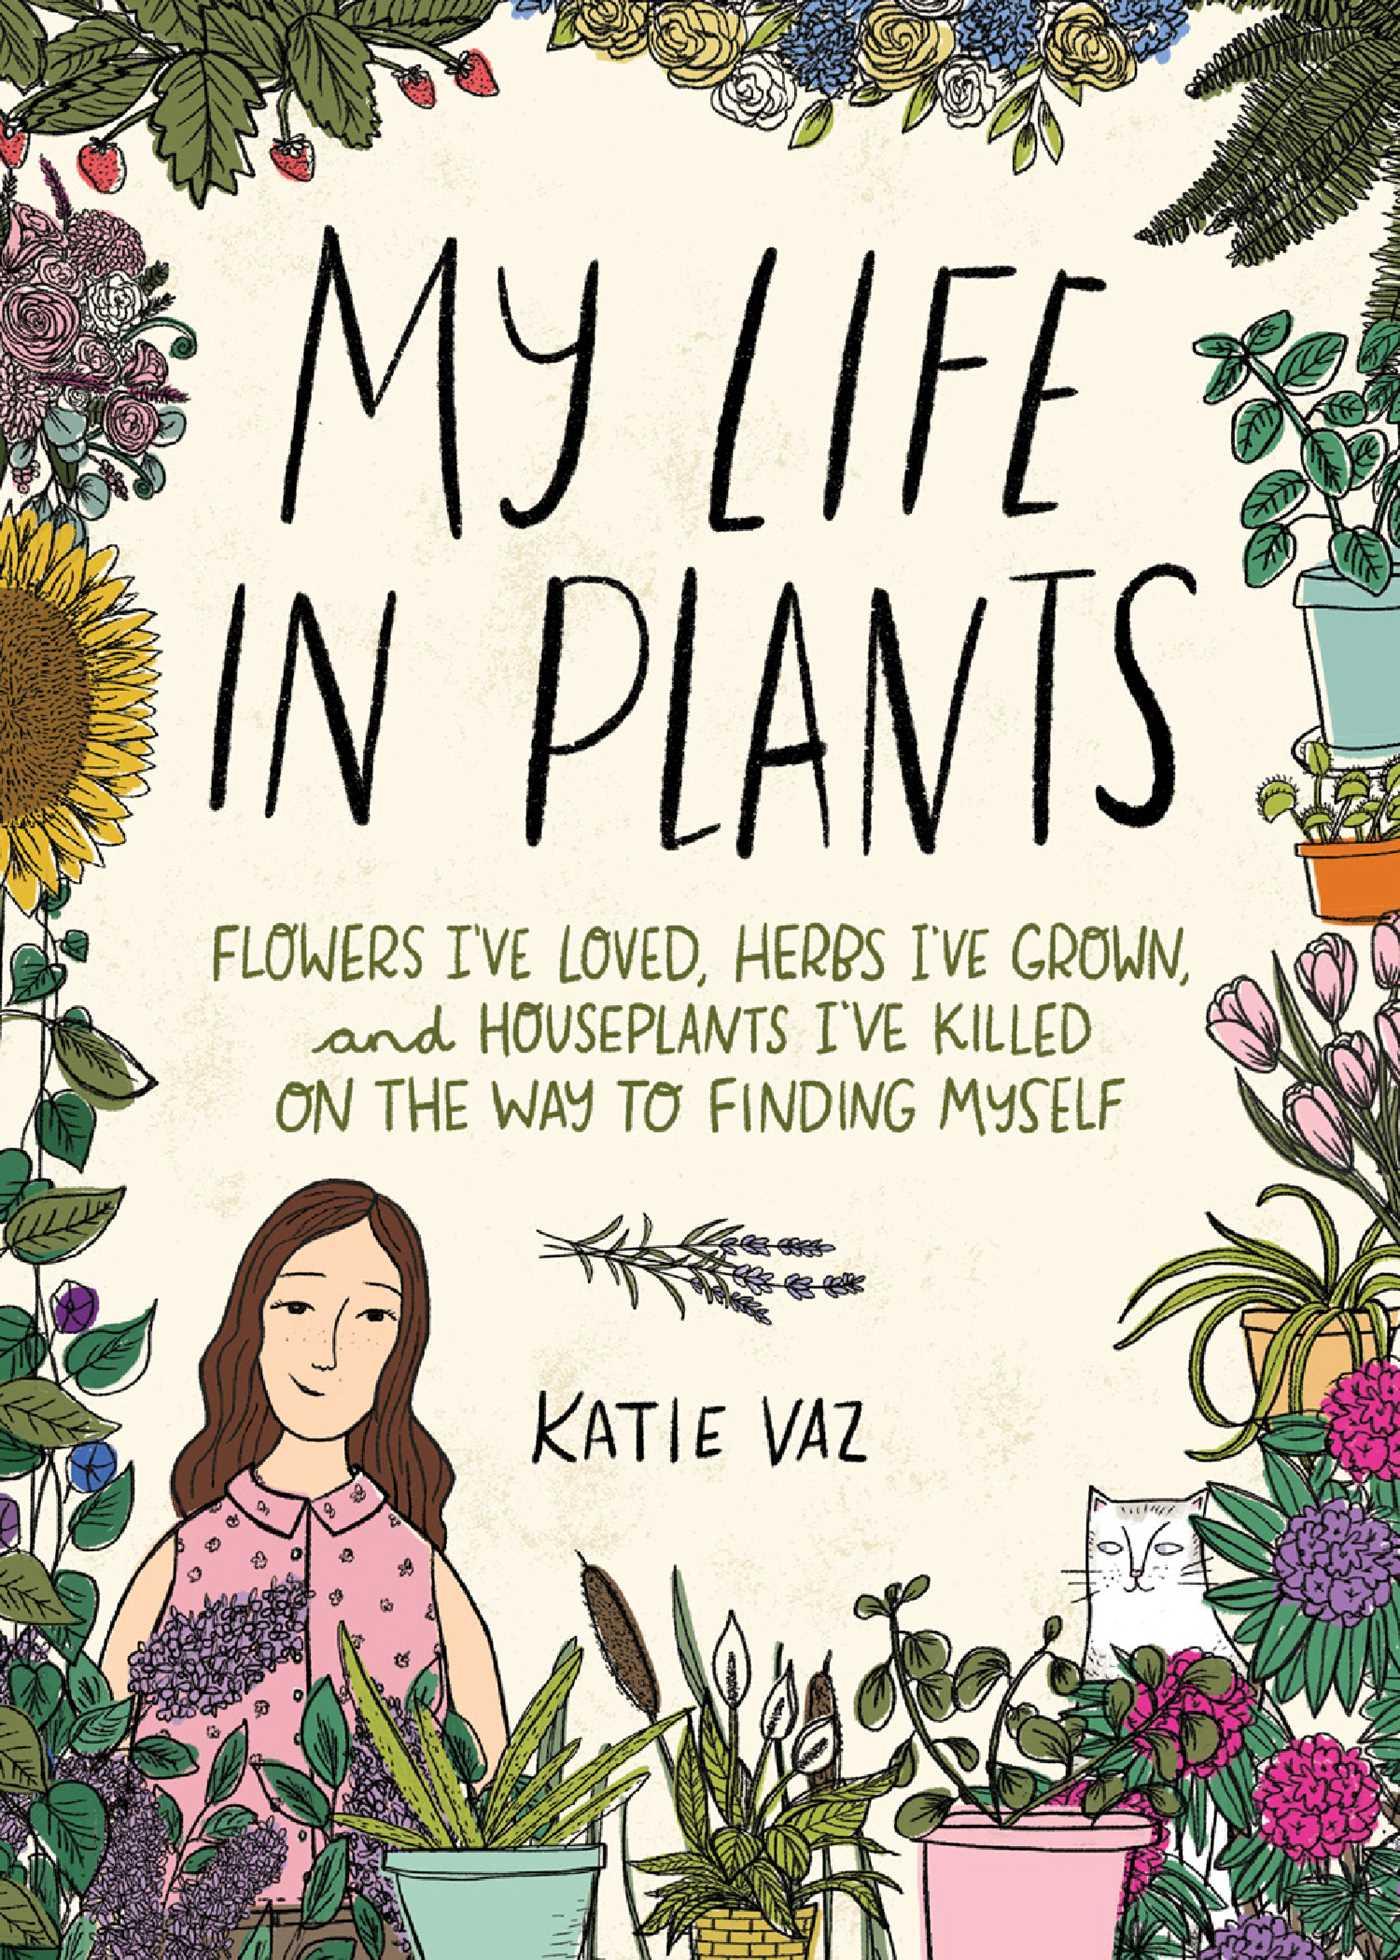 mylifeinplants